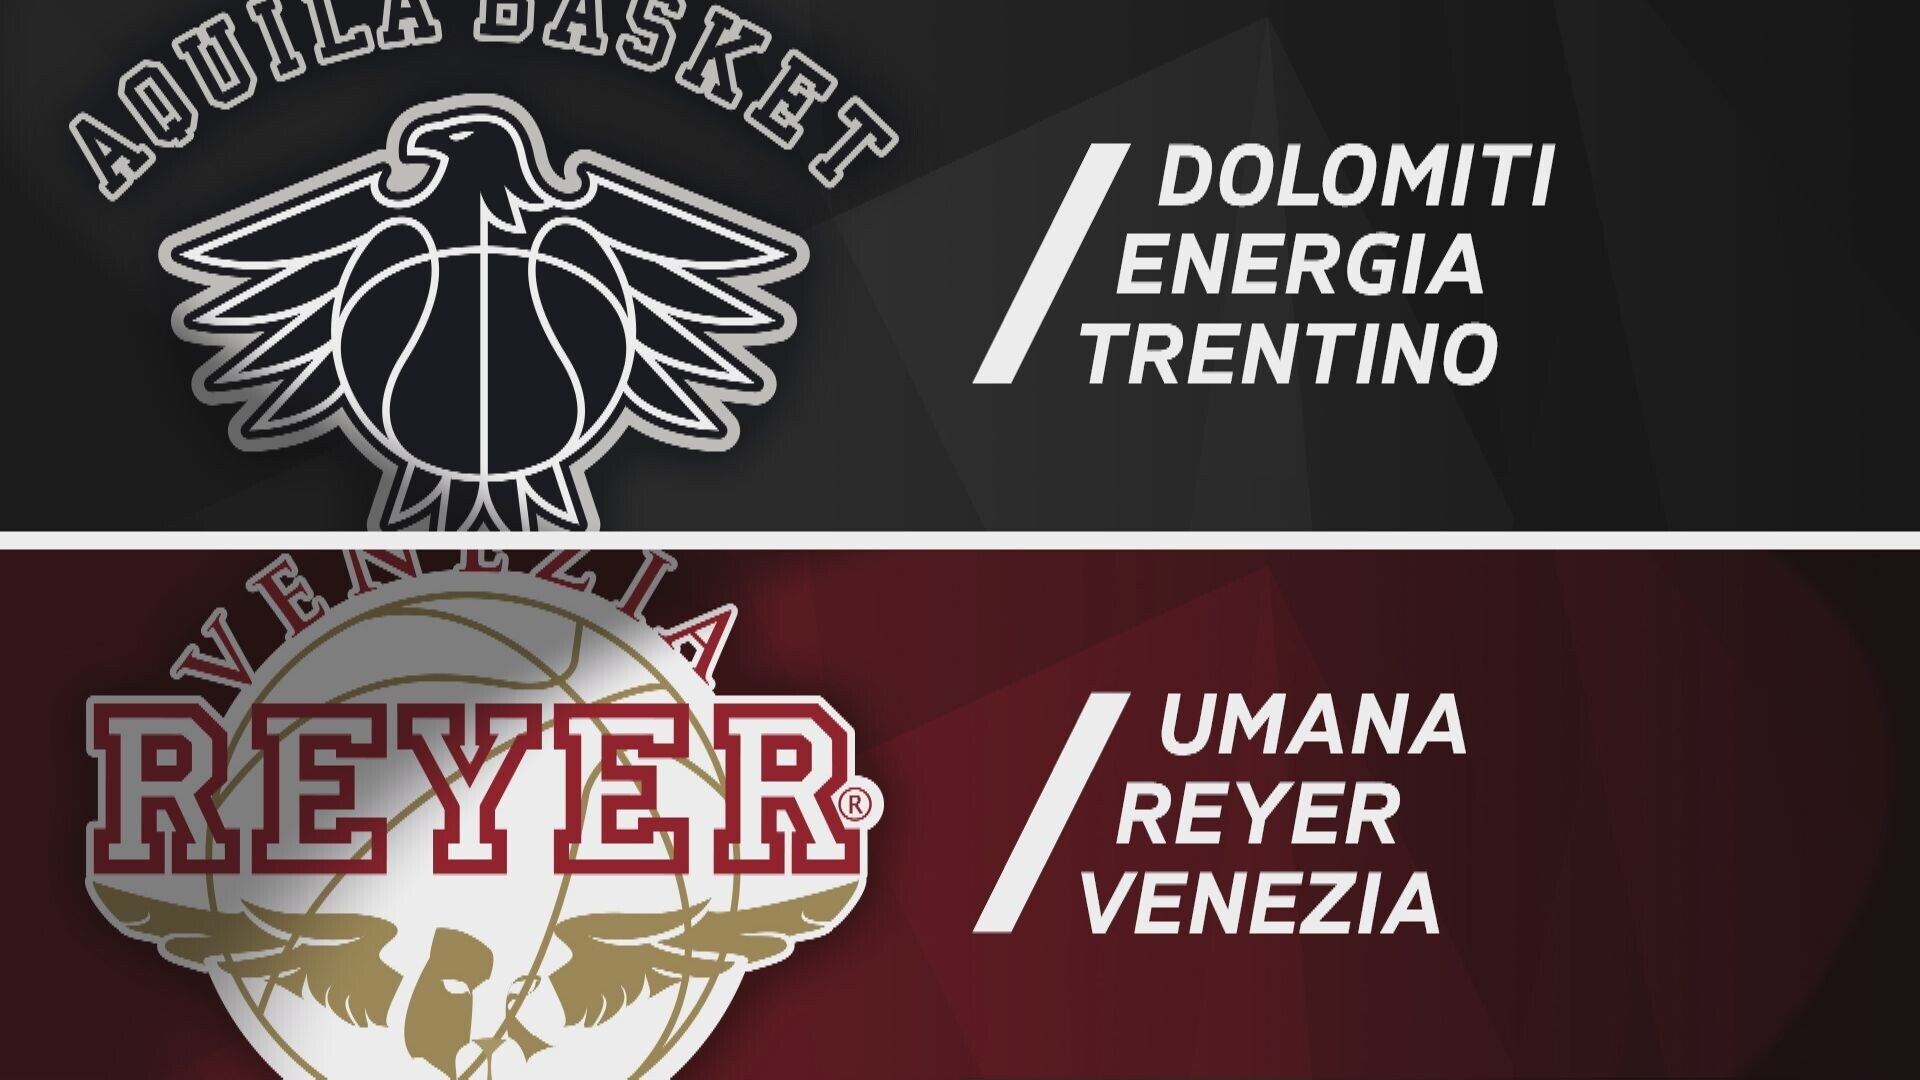 Dolomiti Energia Trentino - Umana Reyer Venezia 90-84